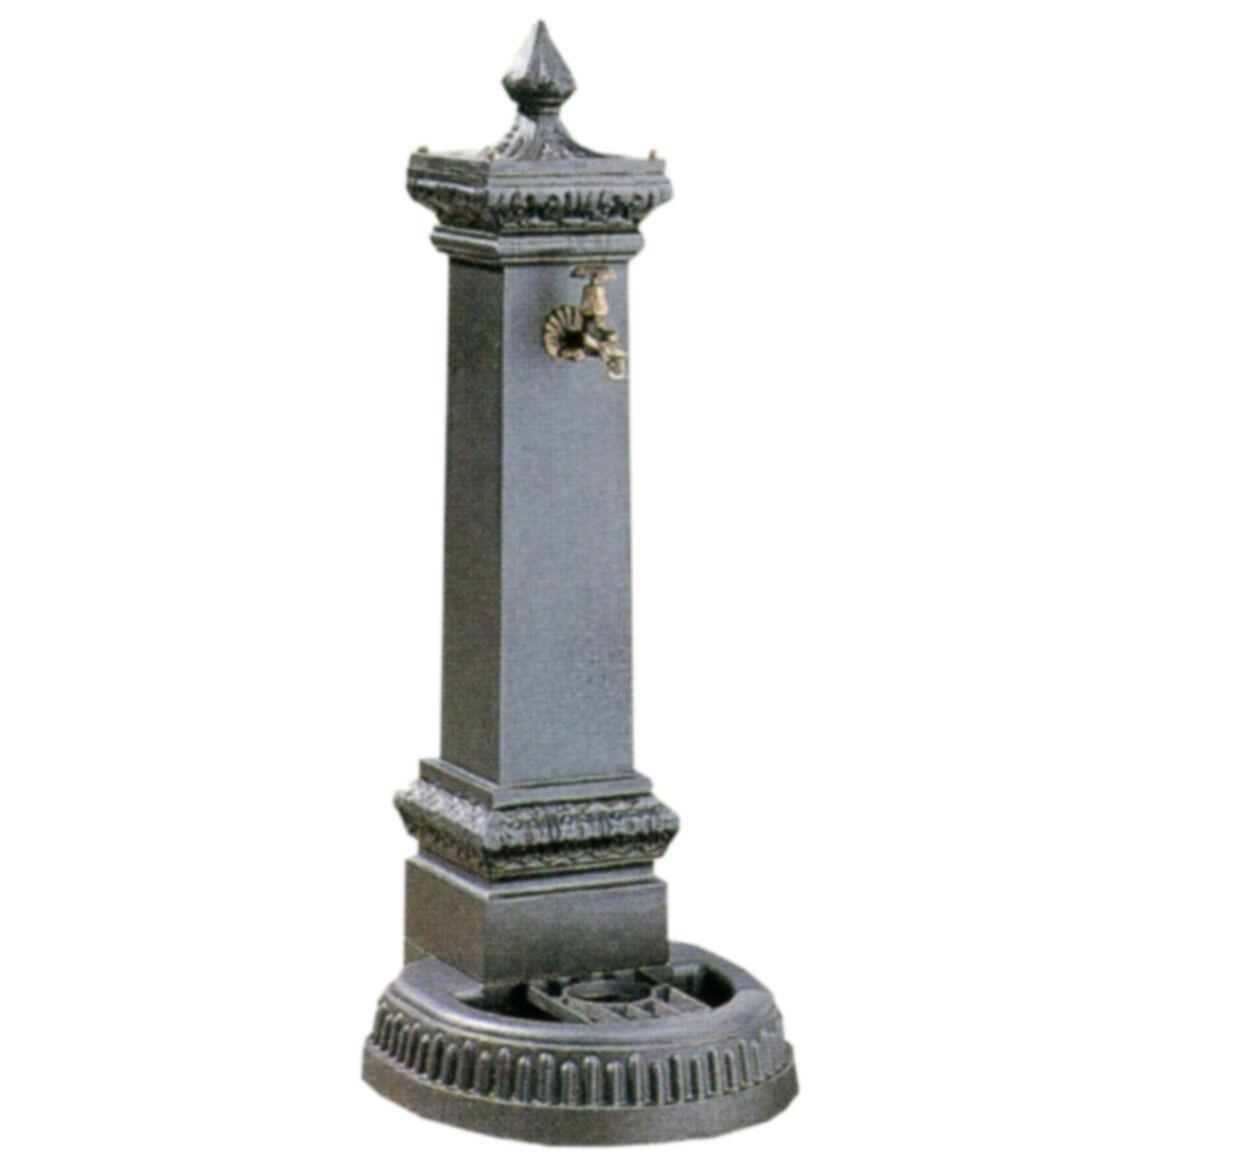 PERINCIOLI Fontana ghisa h 120 tipo milano art.3 PERINCIOLI